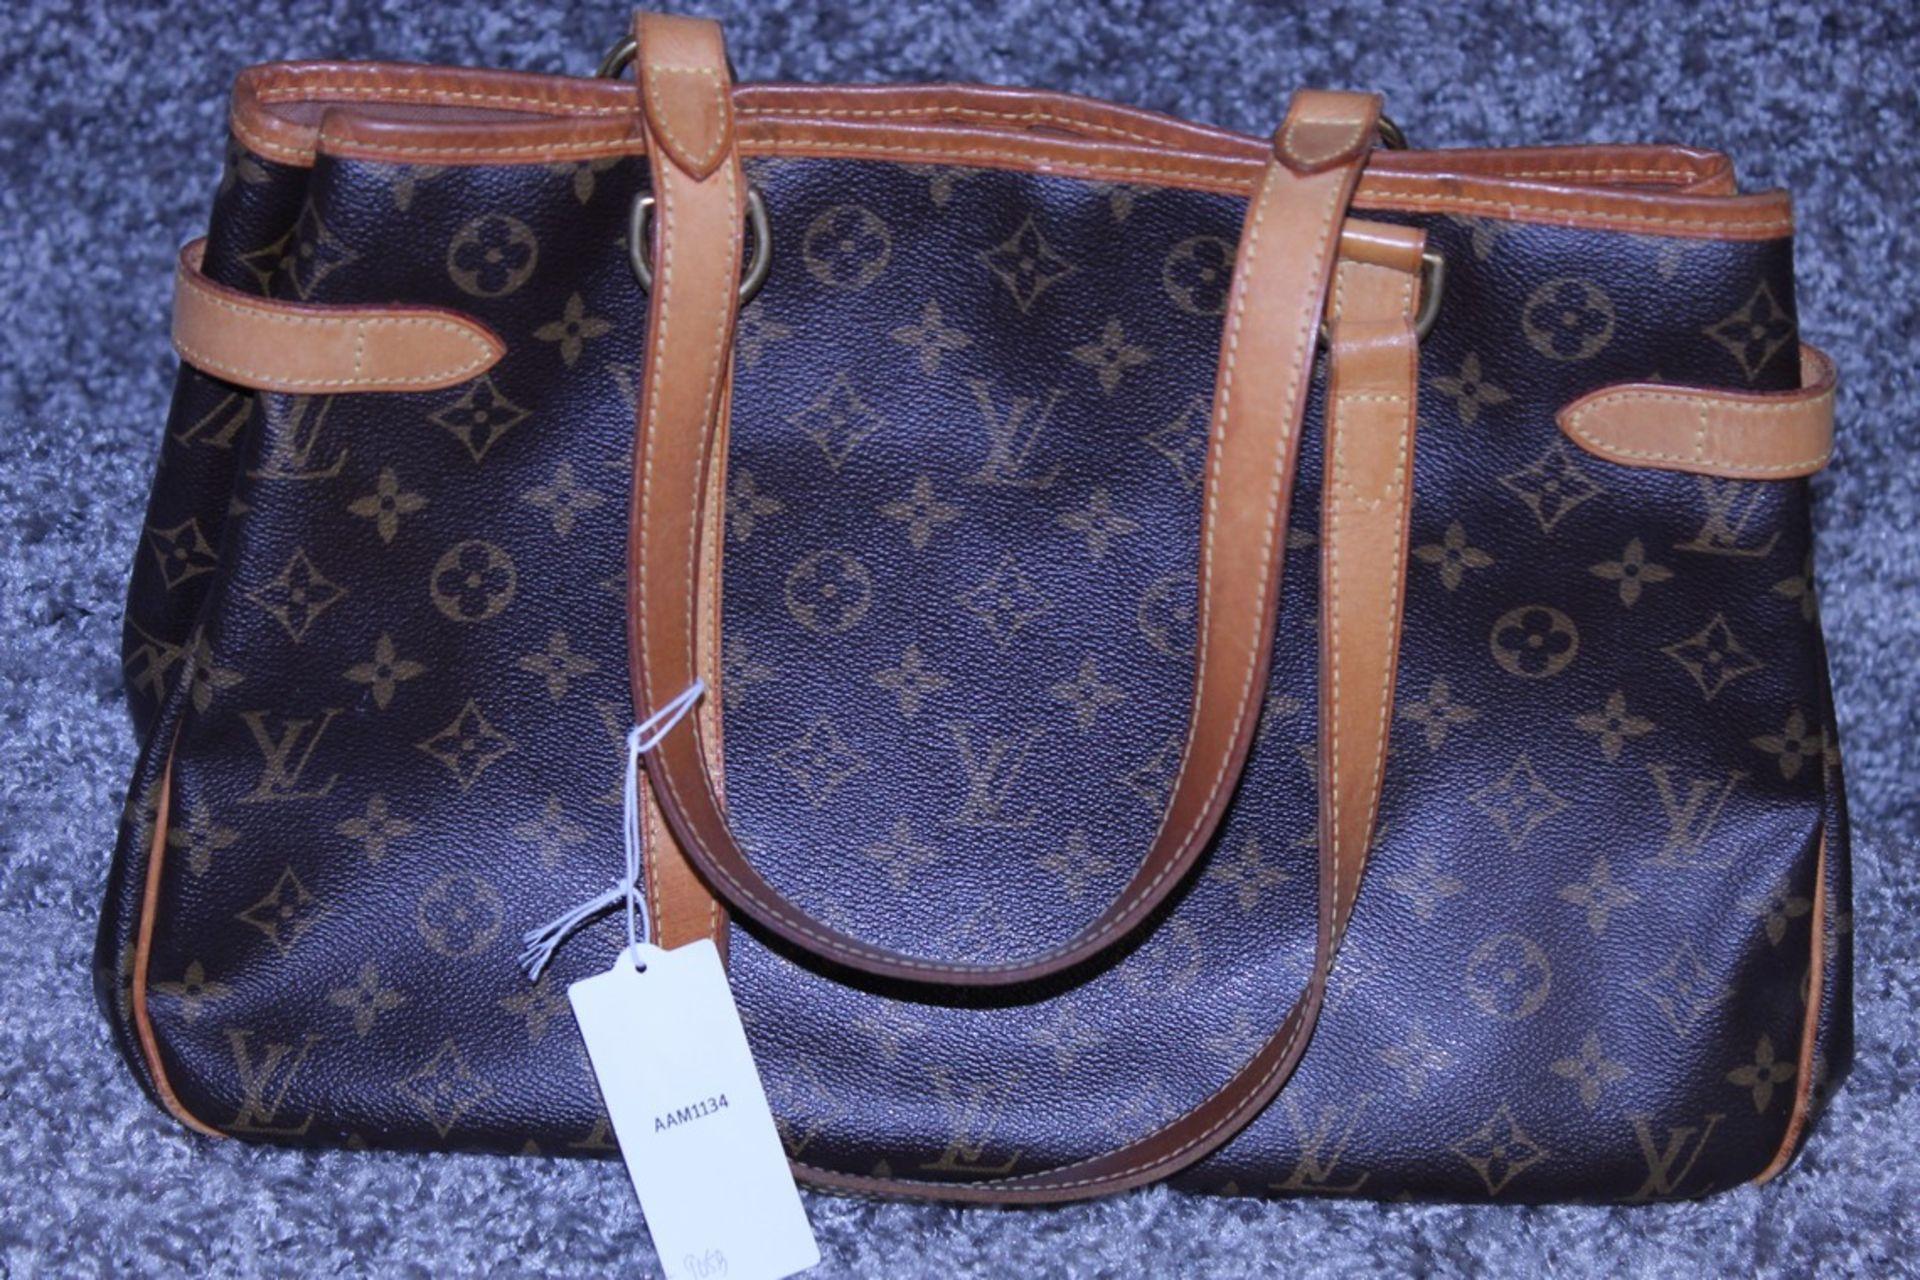 RRP £1,200 Louis Vuitton Batignolles Horizontal Shoulder Bag, Brown Monogram Canvas, Vachetta - Image 2 of 3